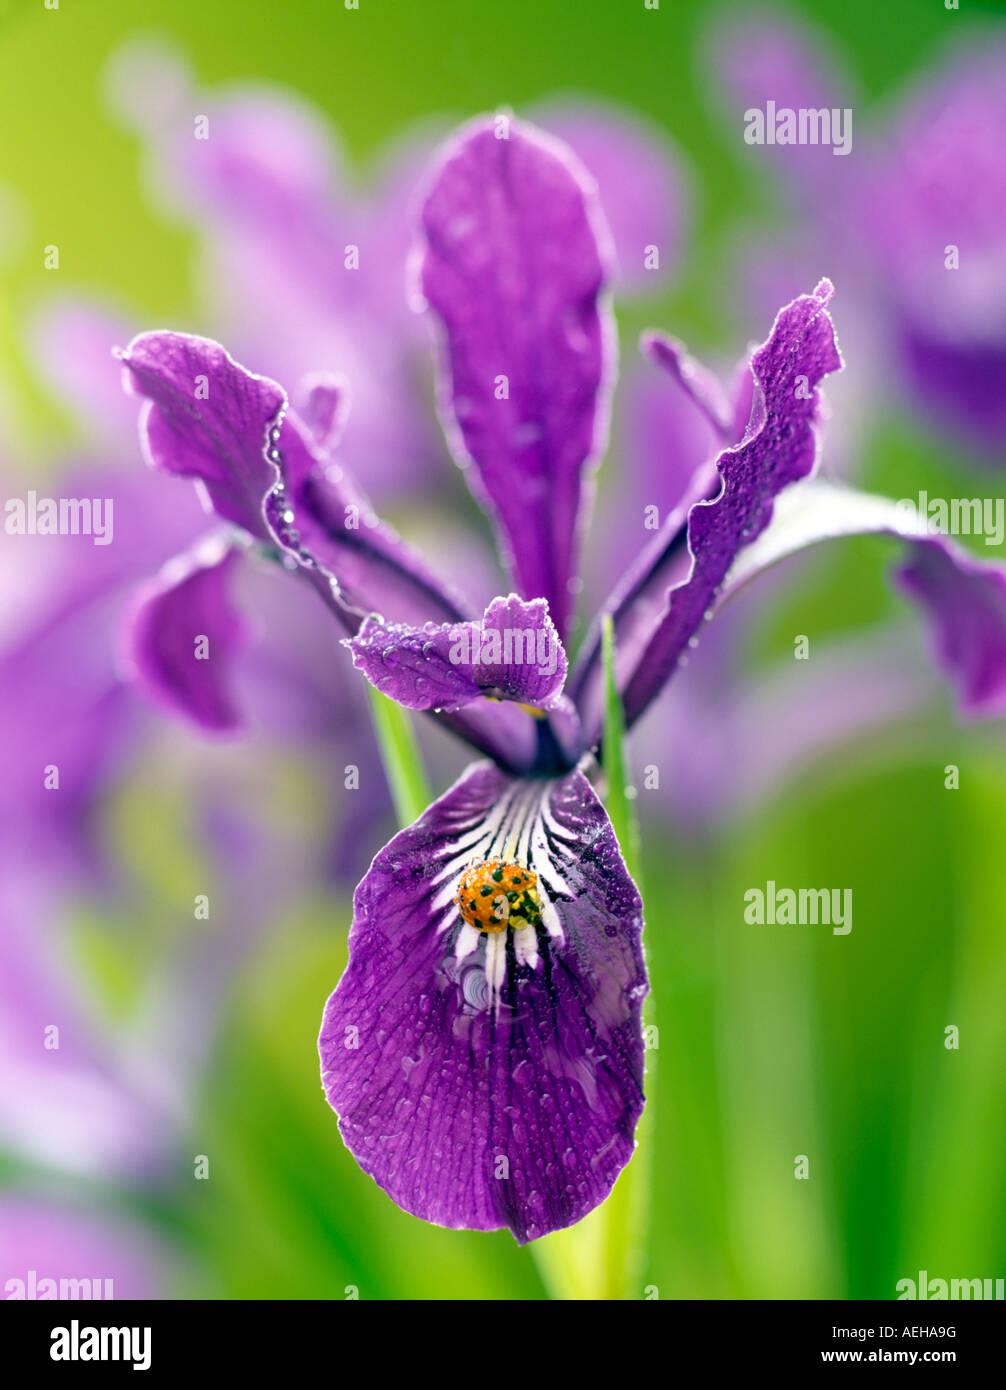 Wild Iris Iris tenax with lagy bug and dew Near Alpine Oregon - Stock Image